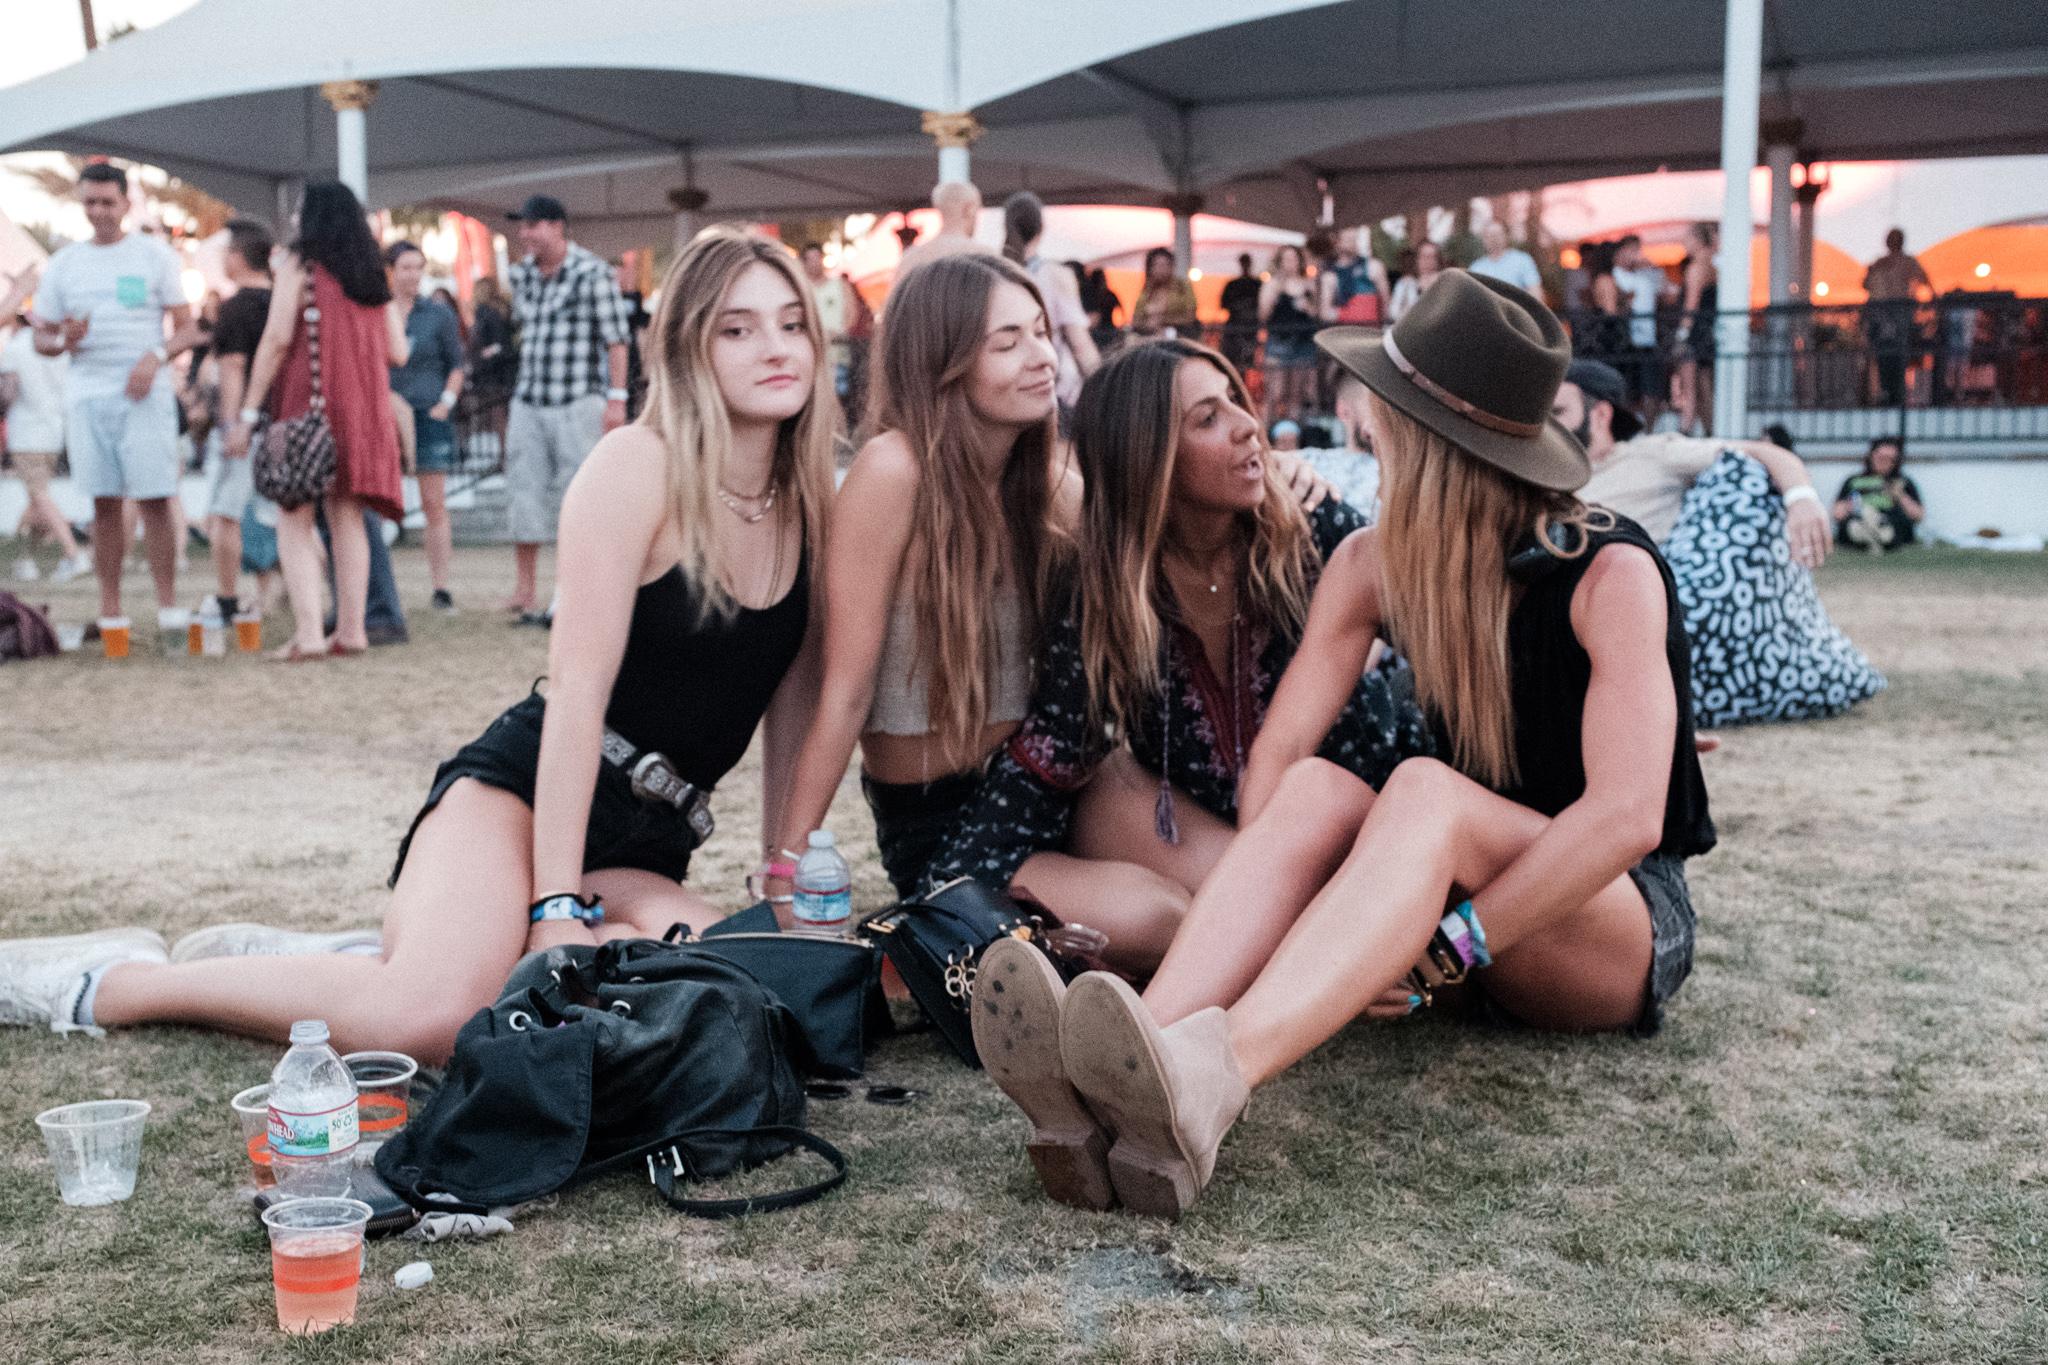 170423 Coachella 17 w2 2100.jpg